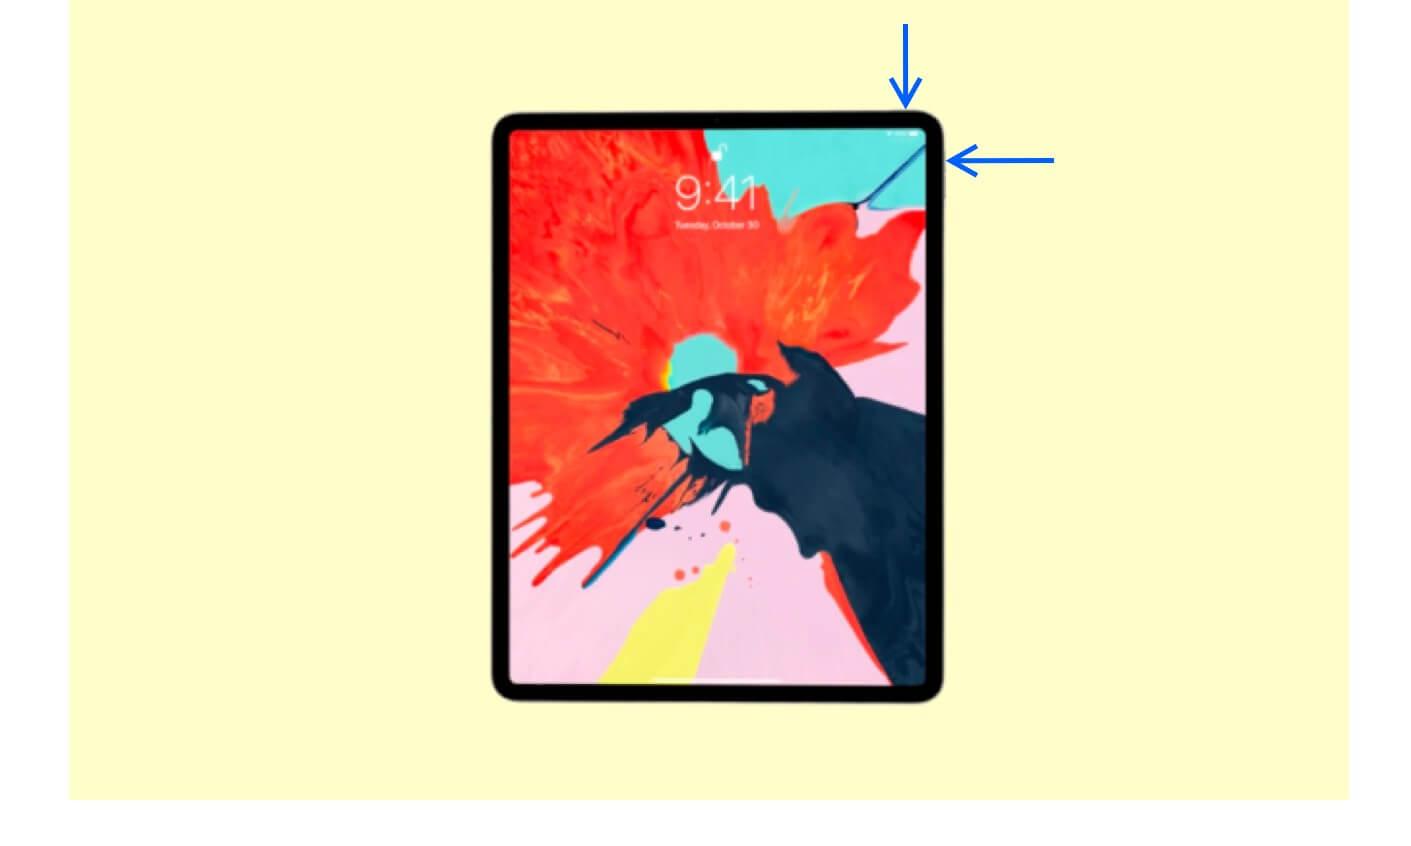 Capture Screenshot on iPad with Face ID